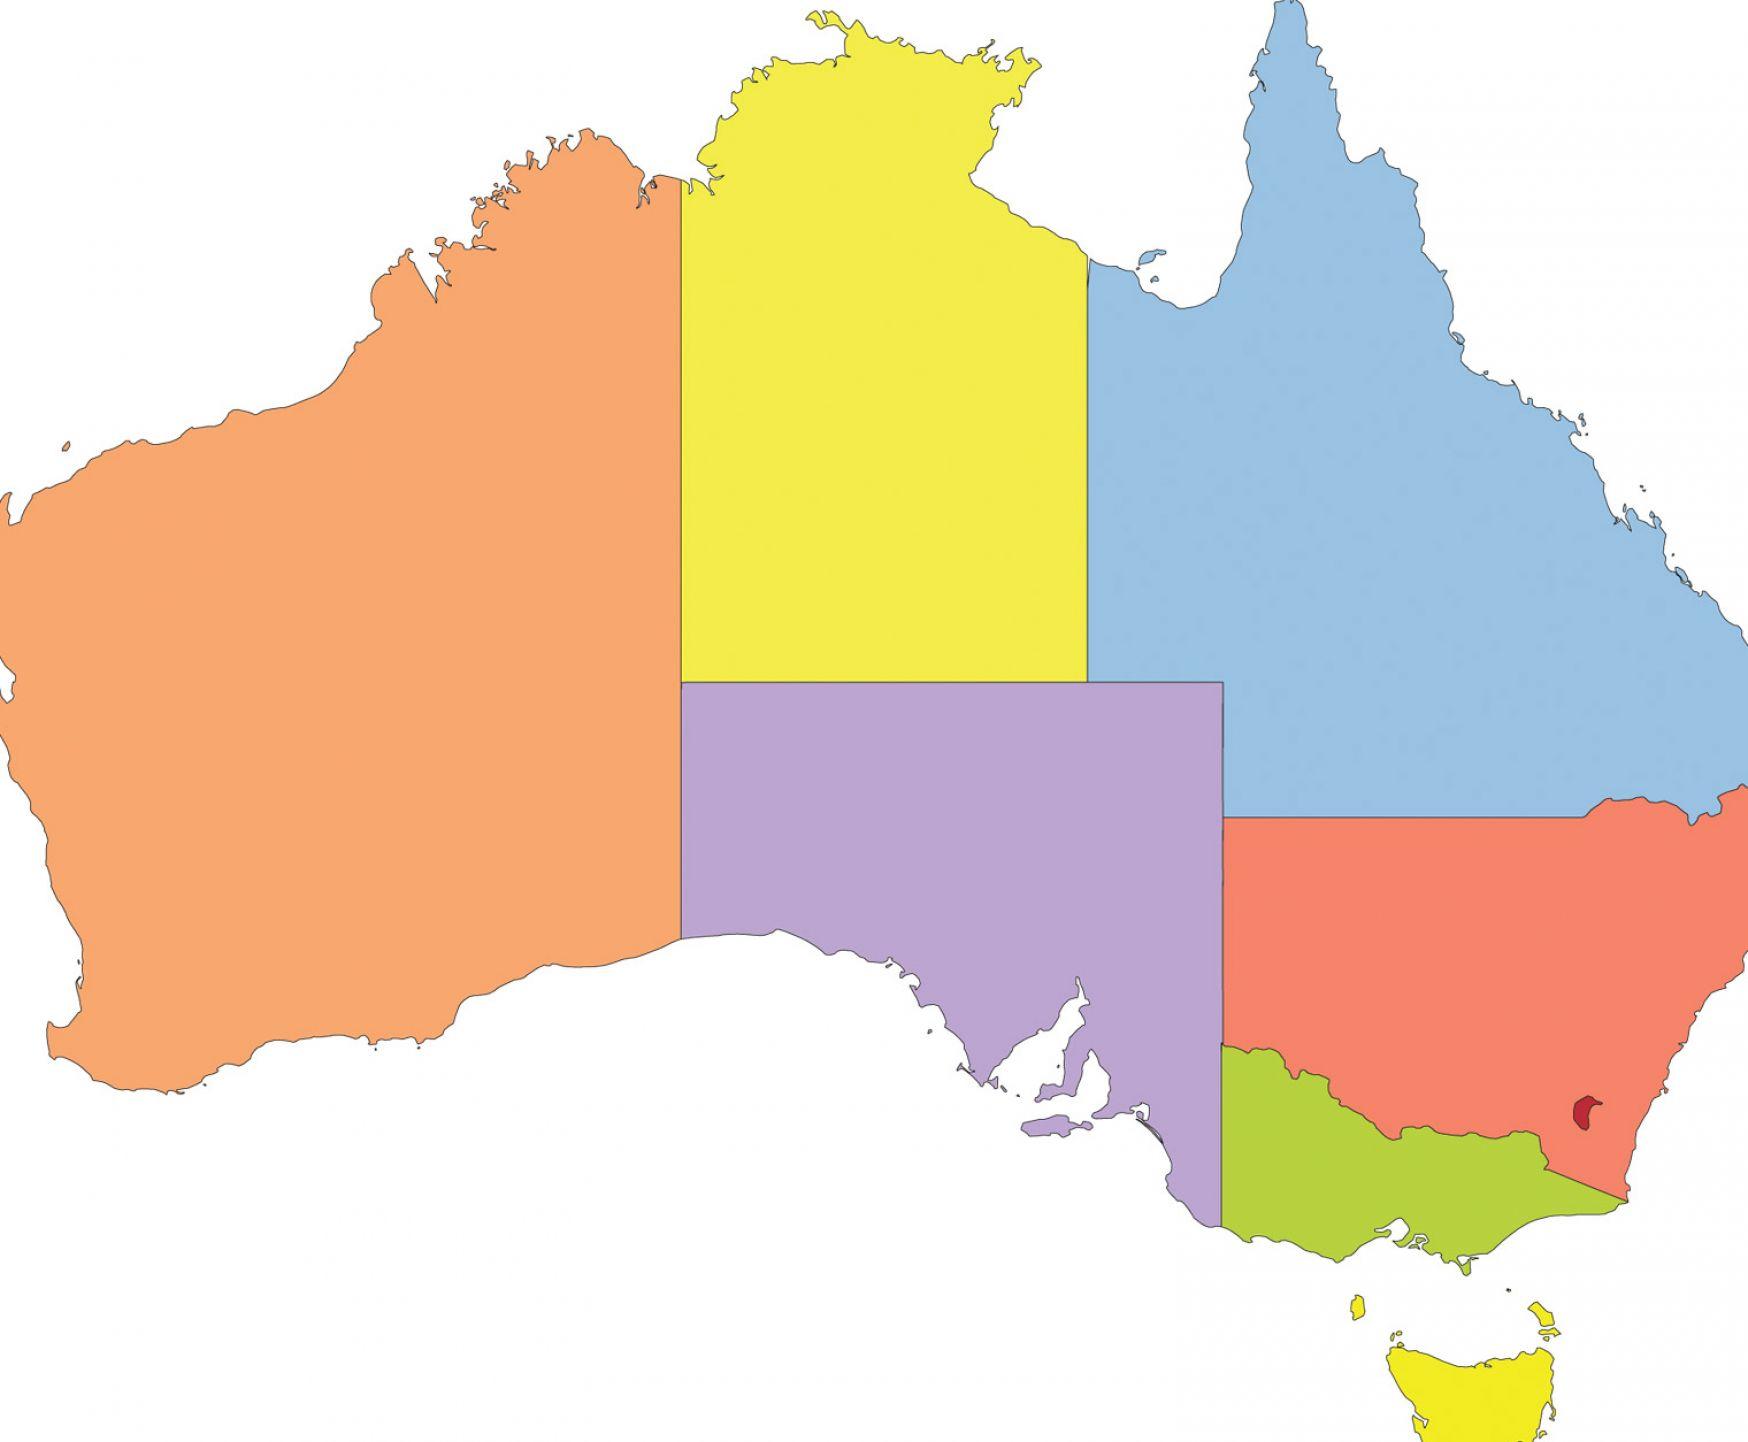 Australia Map Silhouette At Getdrawings